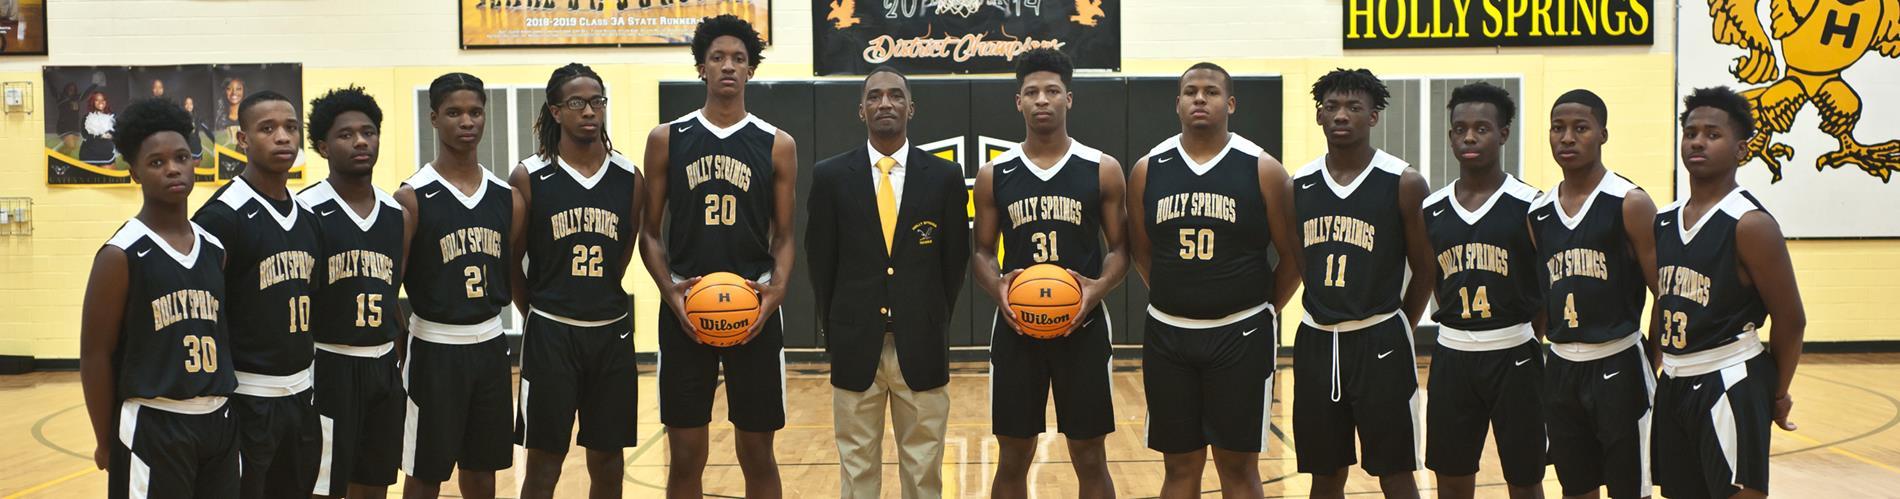 Boys Basketball 2019-2020